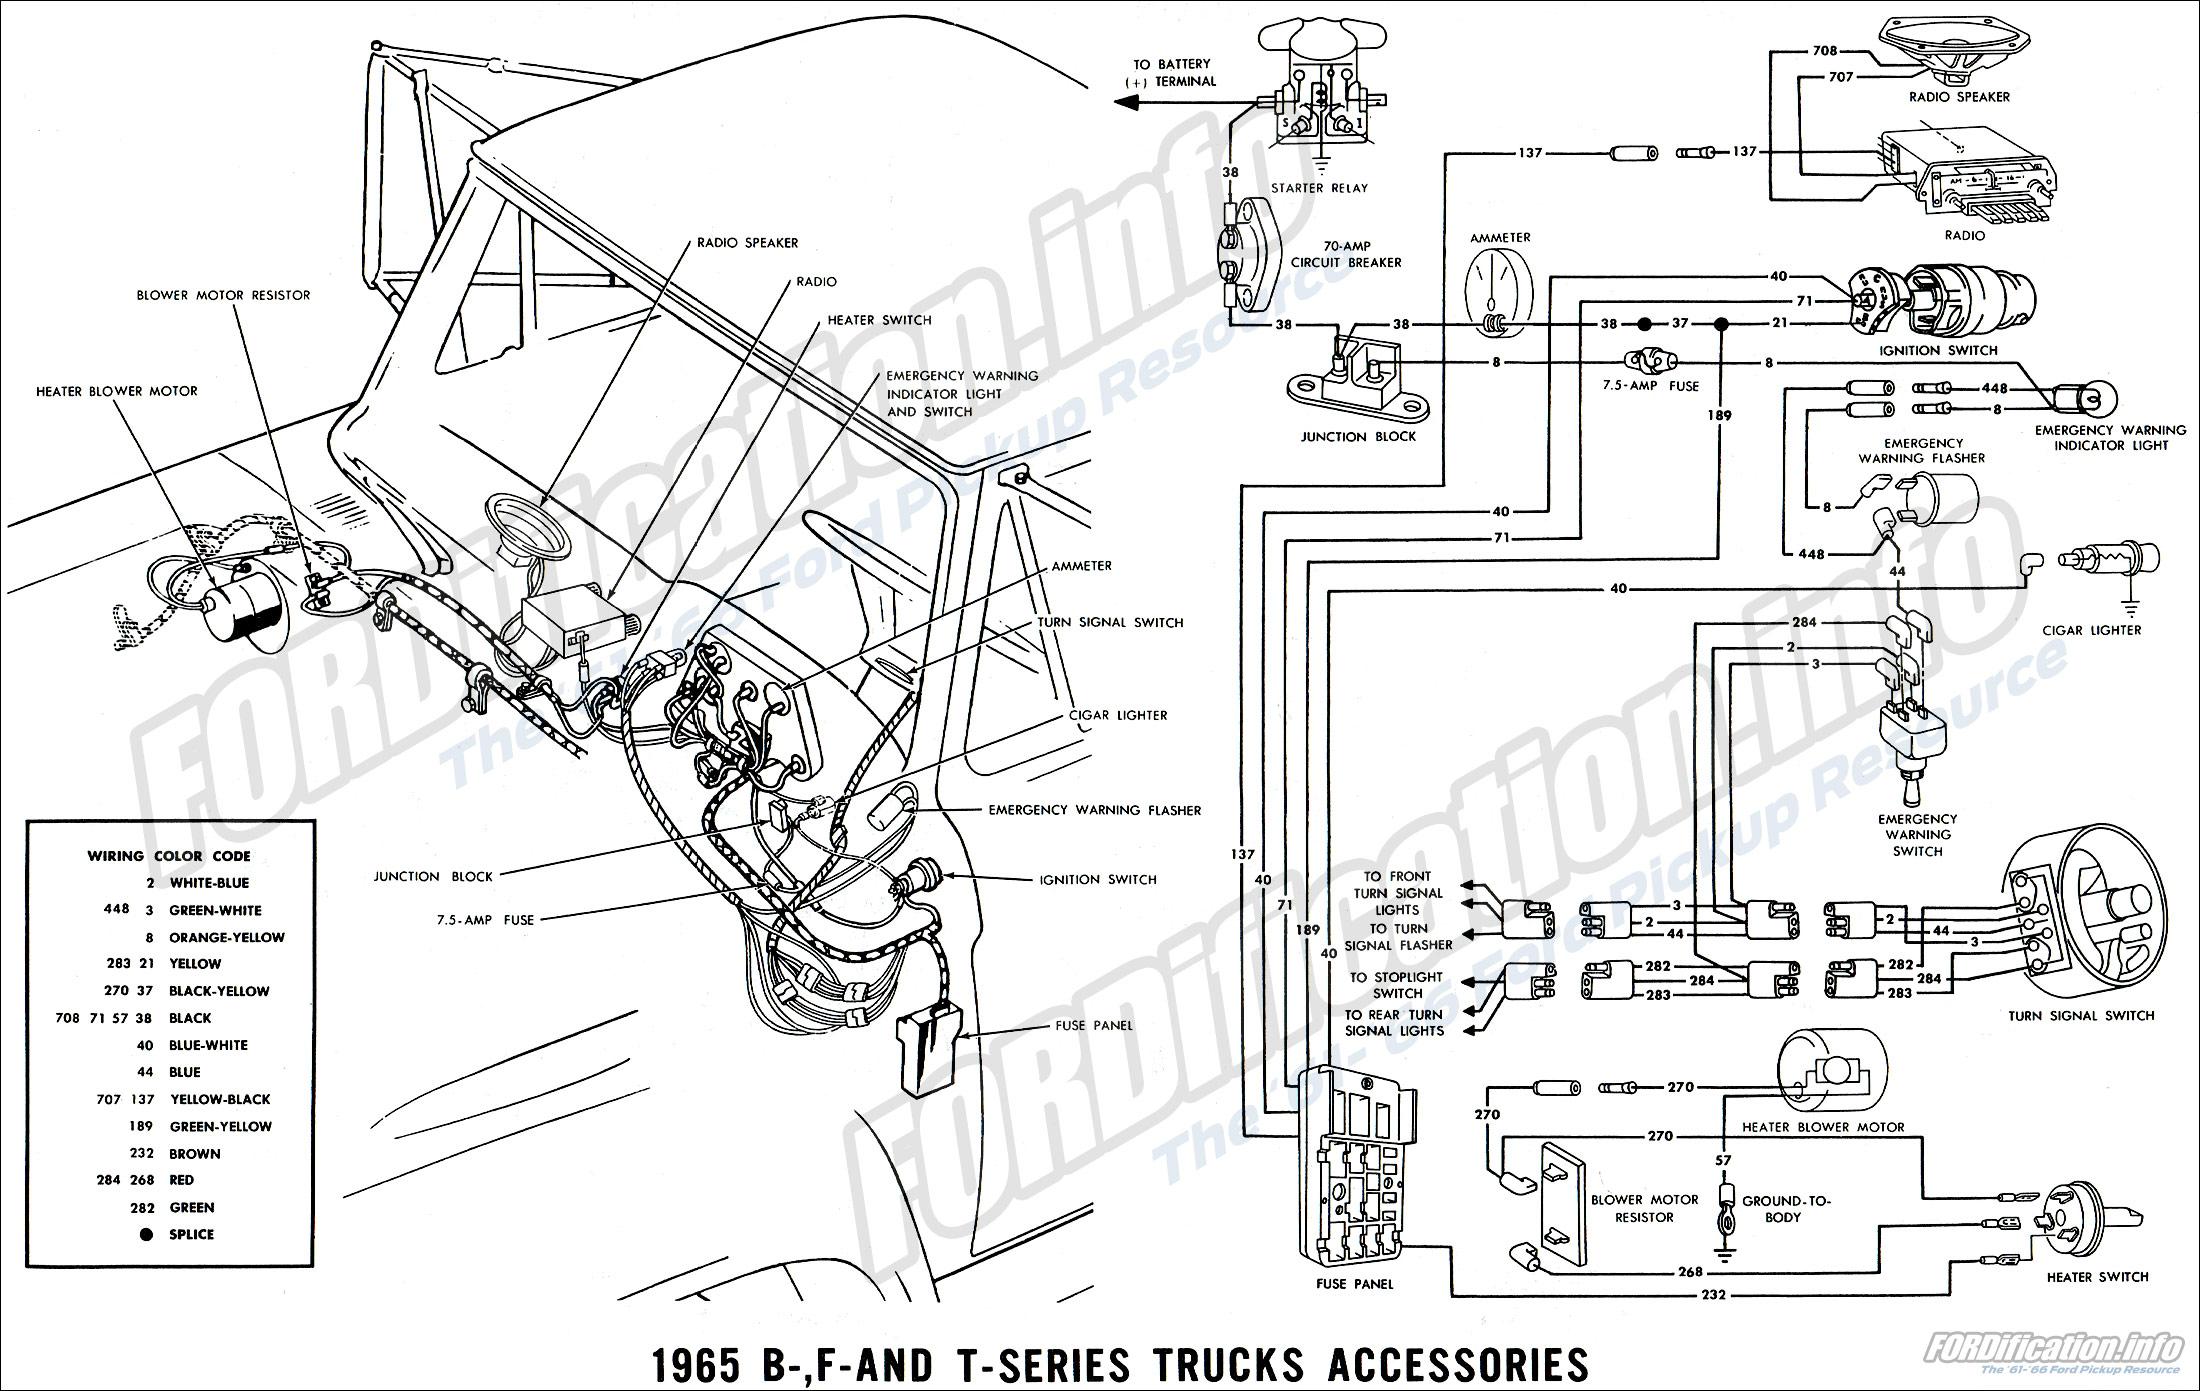 EC_4985] 1954 Ford F100 Wiring Diagram Likewise 1965 Ford Galaxie Wiring